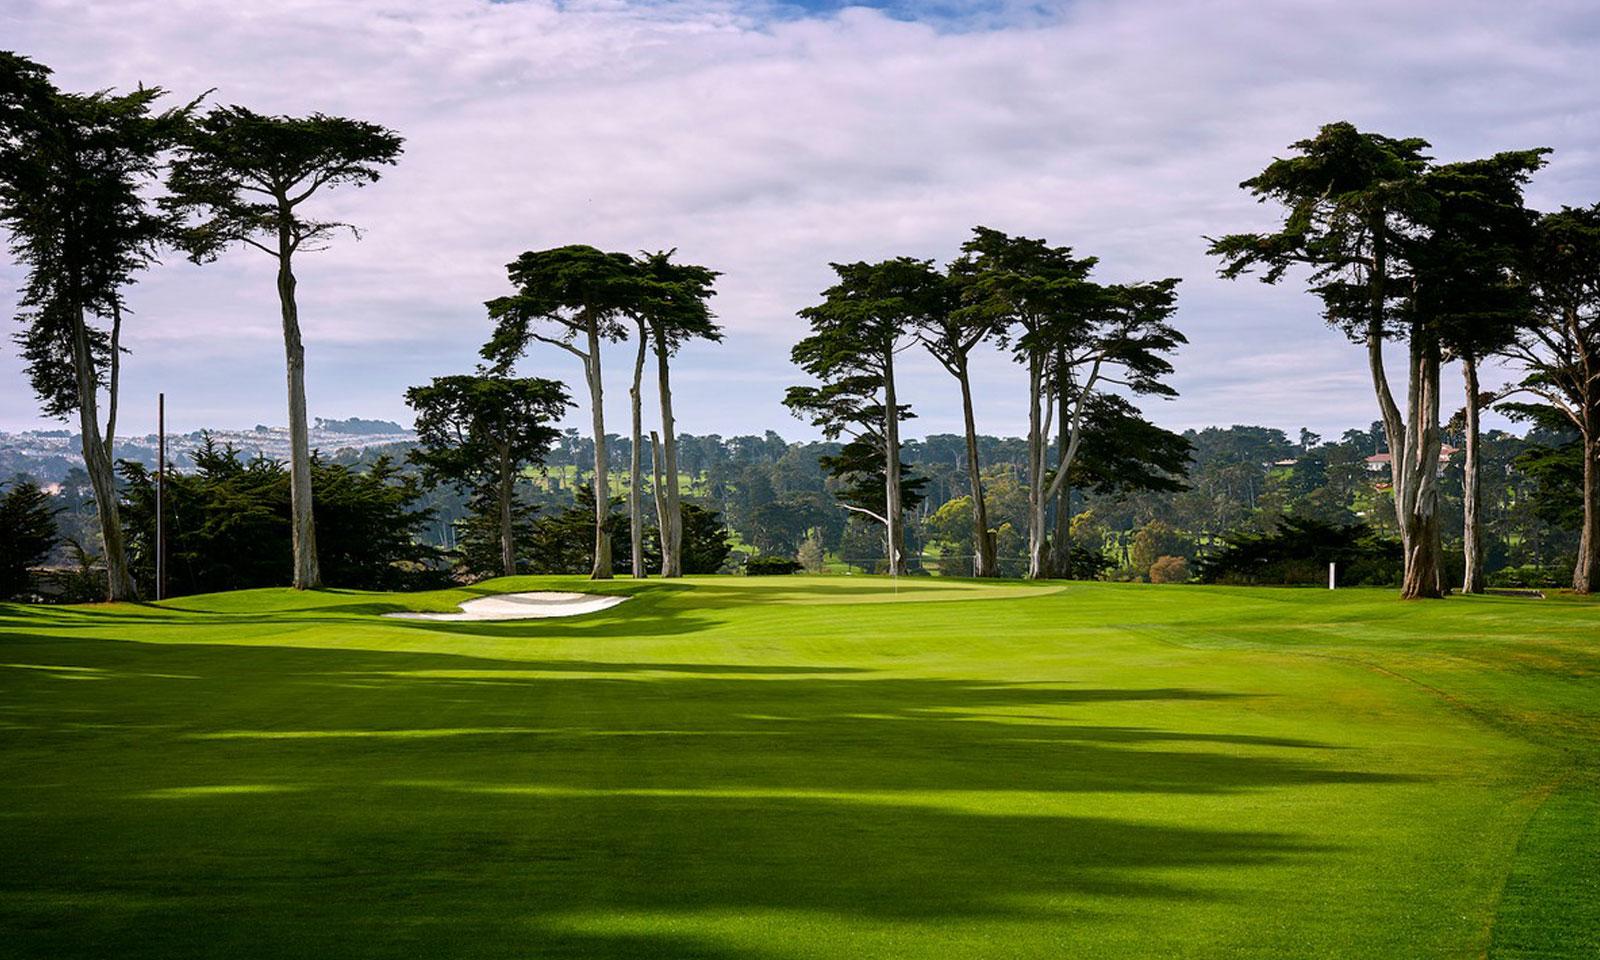 TPC Harding Park Golf Course